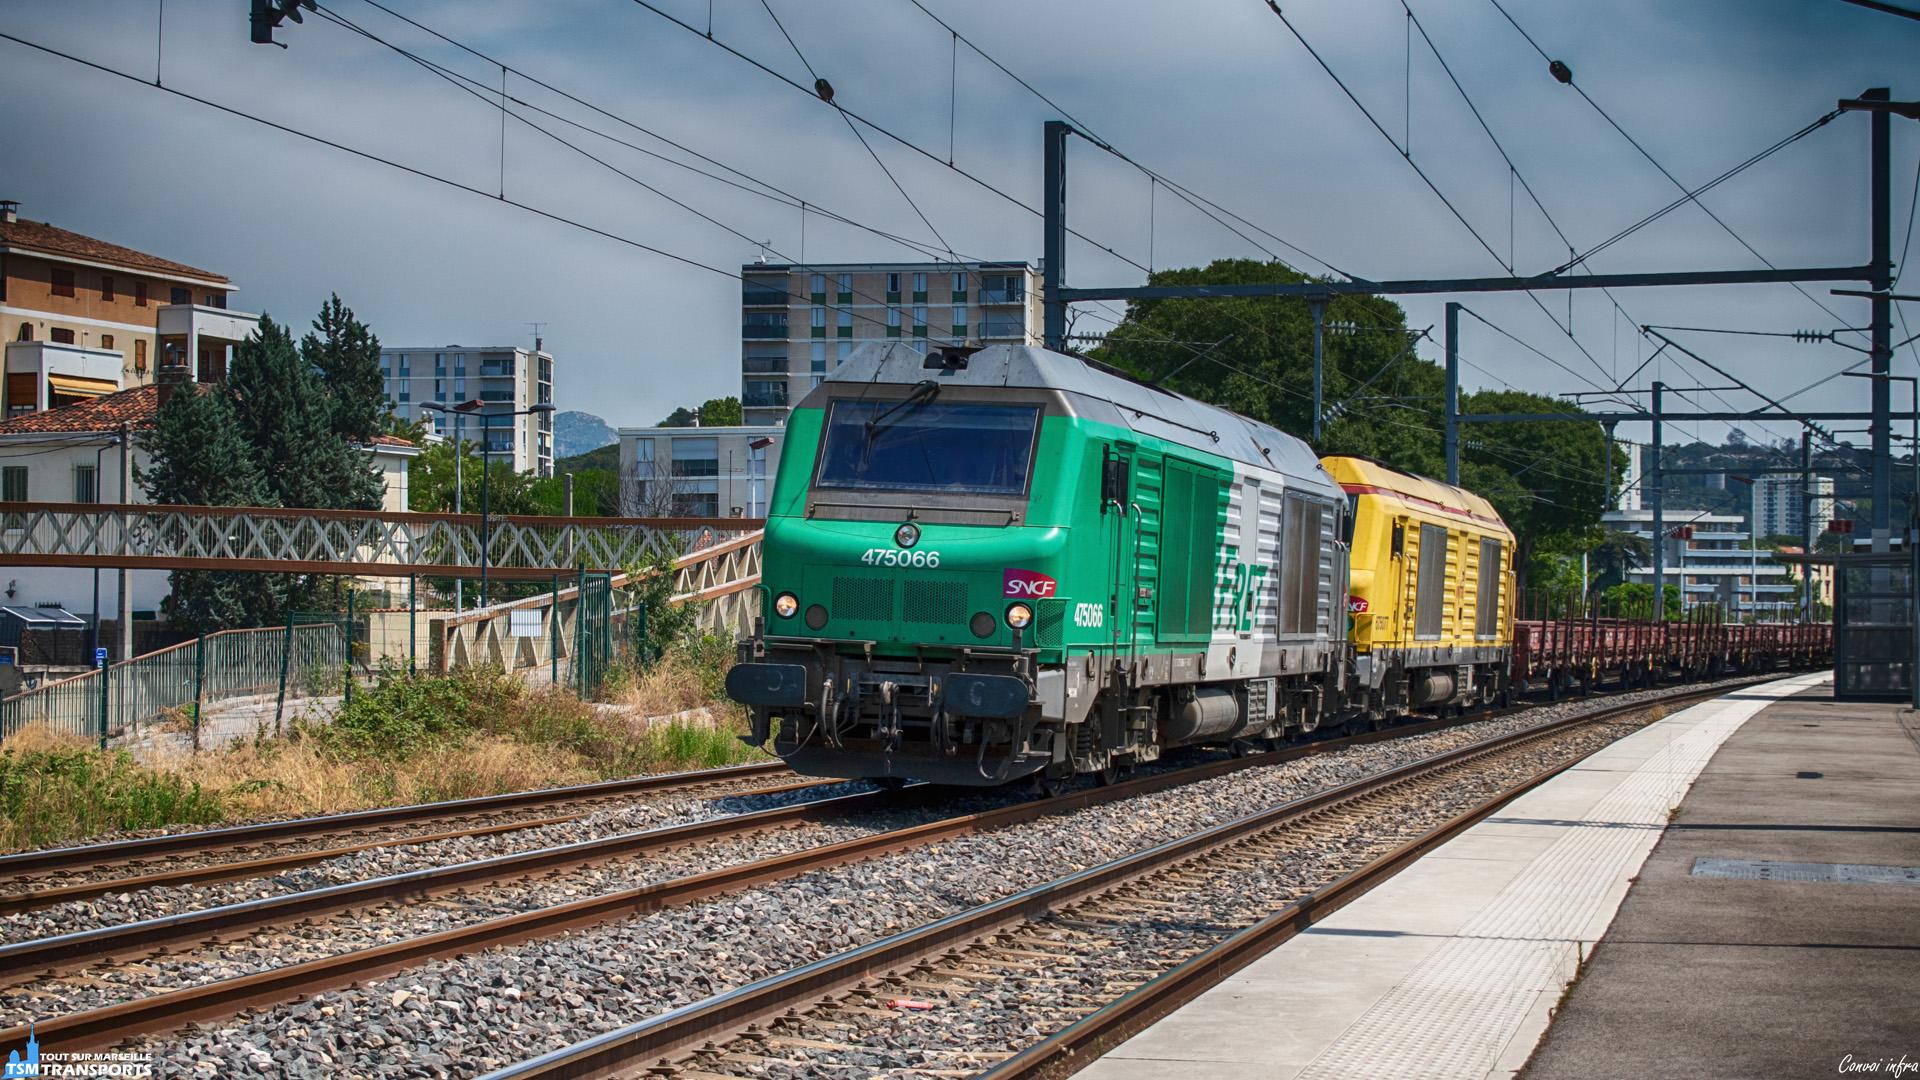 Alstom / Siemens BB75000